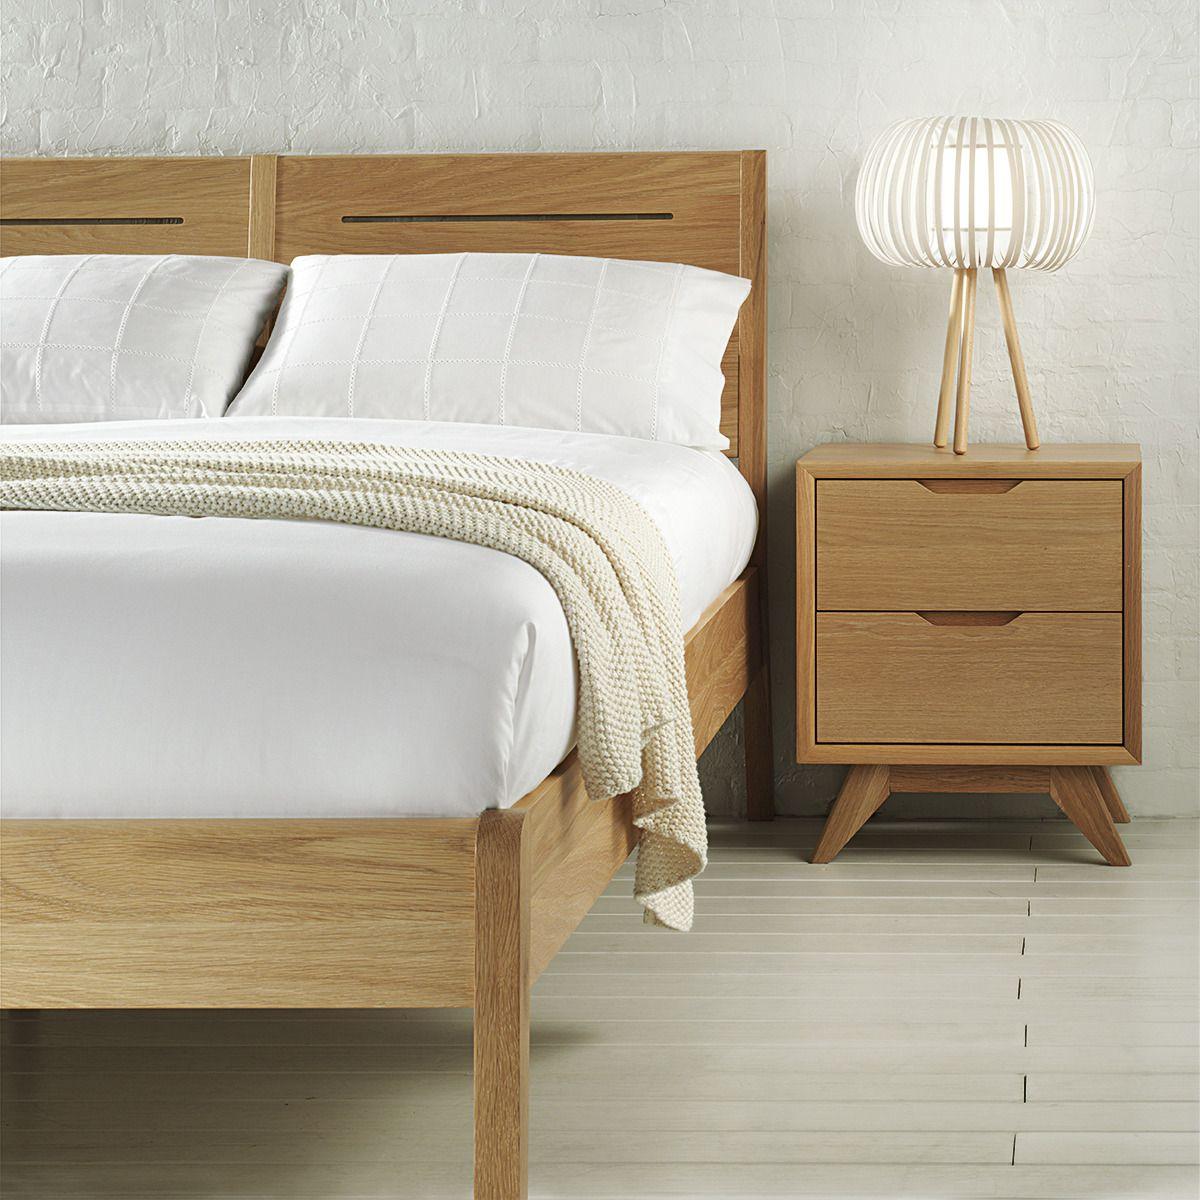 Pin De Cris P En Deco Bedroom Pinterest La Corte Mesita  # Muebles De Bedroom En Ingles